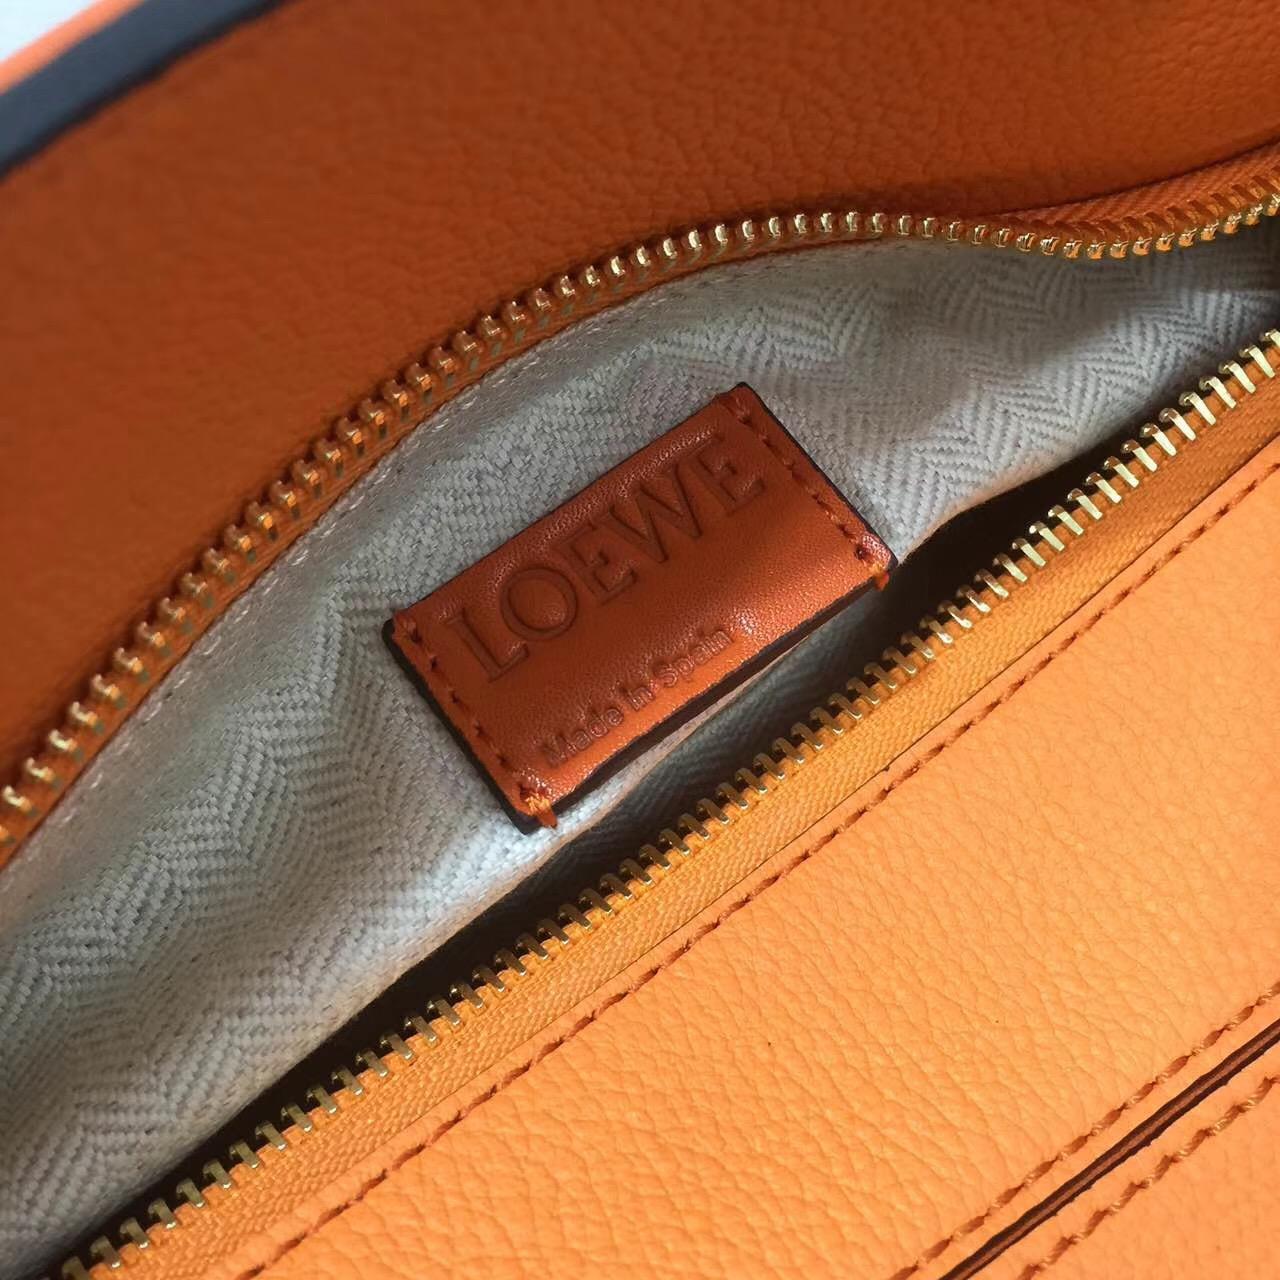 Loewe羅意威小號幾何包 Puzzle Small Bag Apricot/Orange 顆粒小牛皮